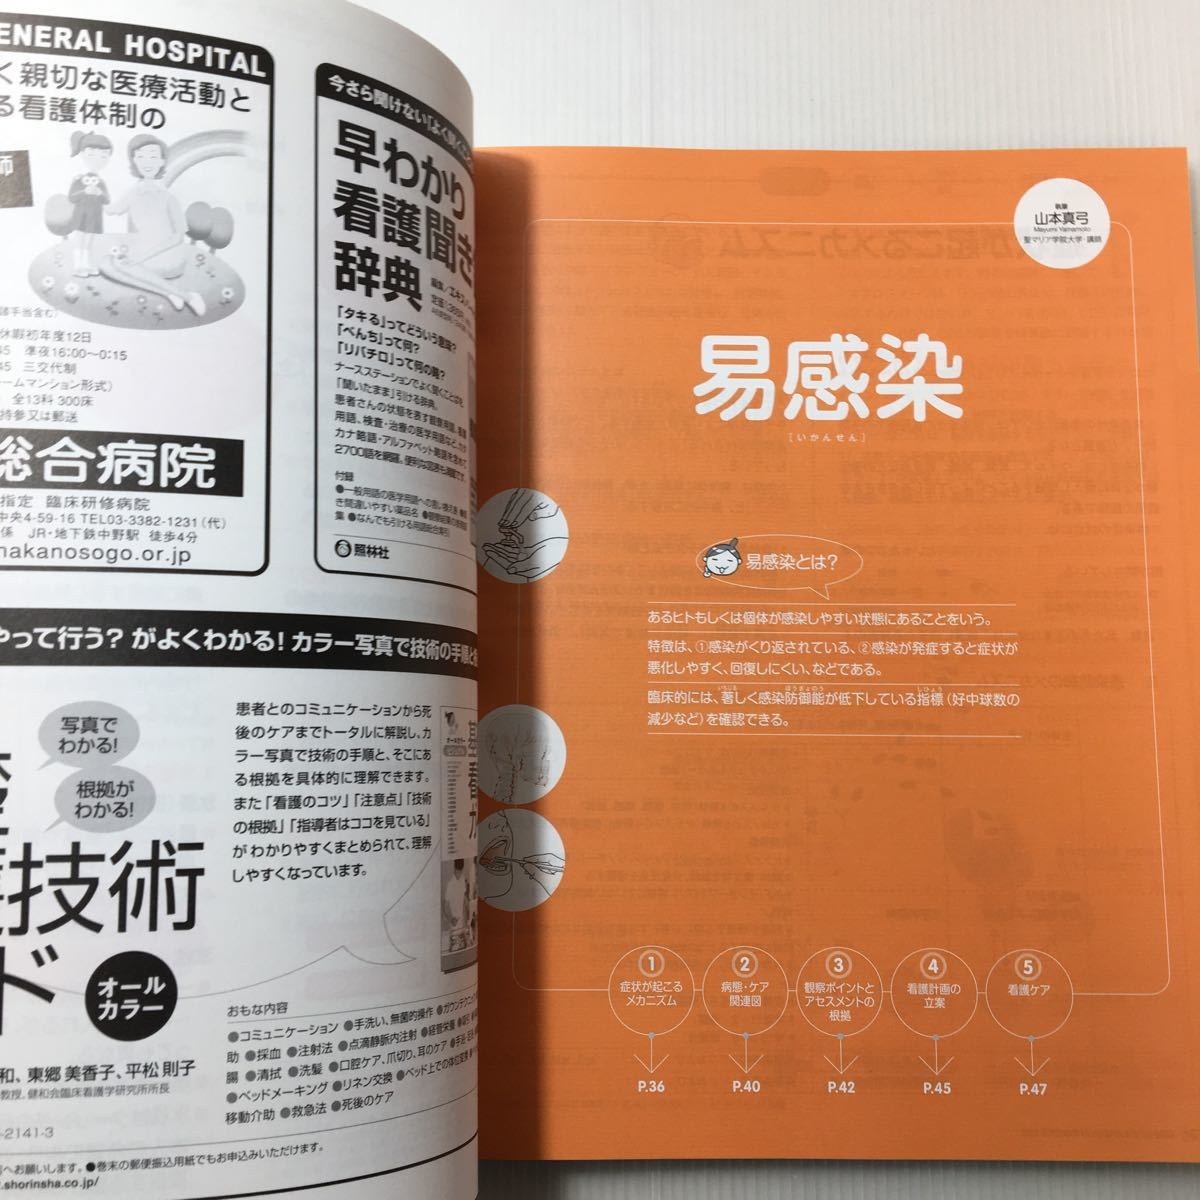 zaa-070★プチナース 症状別看護過程パート2 病態生理がわかる! ケアができる!  2007年08月臨時増刊号[雑誌] 森山慶子 (編集)